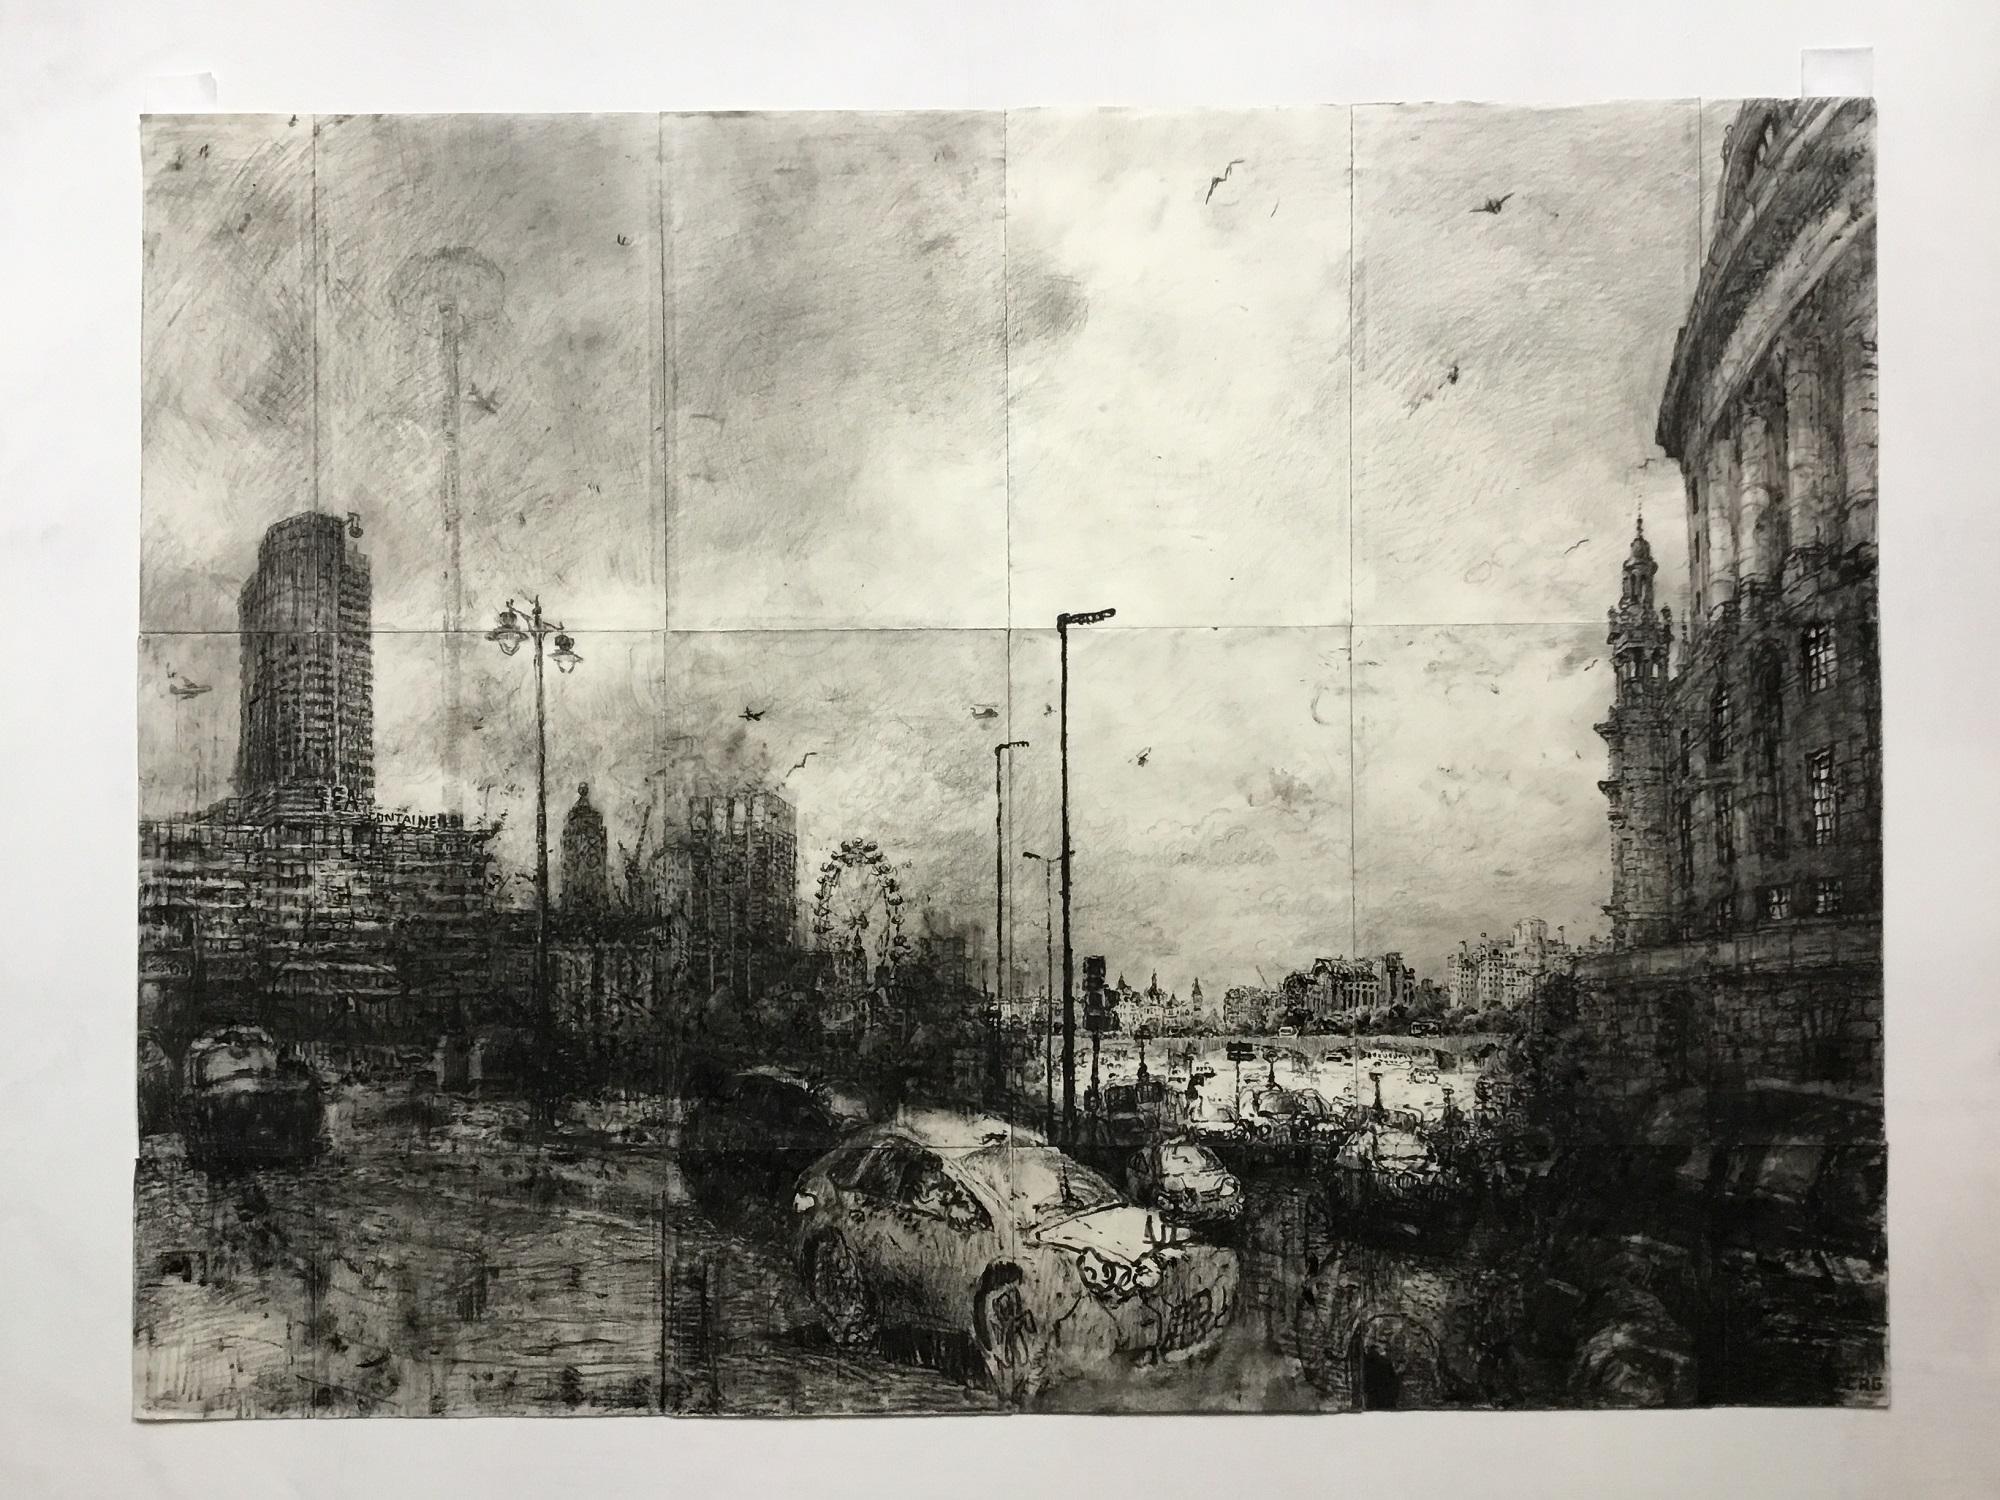 'Blackfriars Traffic' Christopher Green, Pencil, 60x80cm, 2017